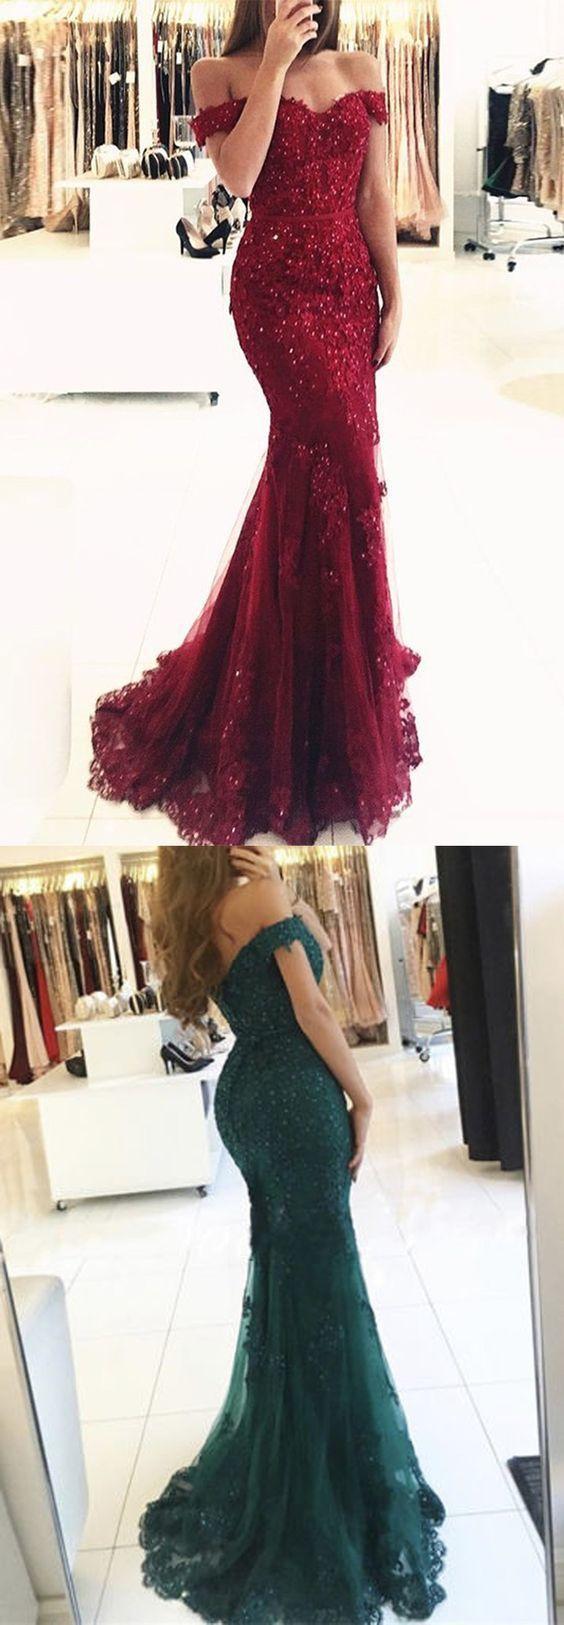 Mermaid Prom Dresses,Off-the-Shoulder Prom Dresses,Dark Red Prom Dresses,Tulle